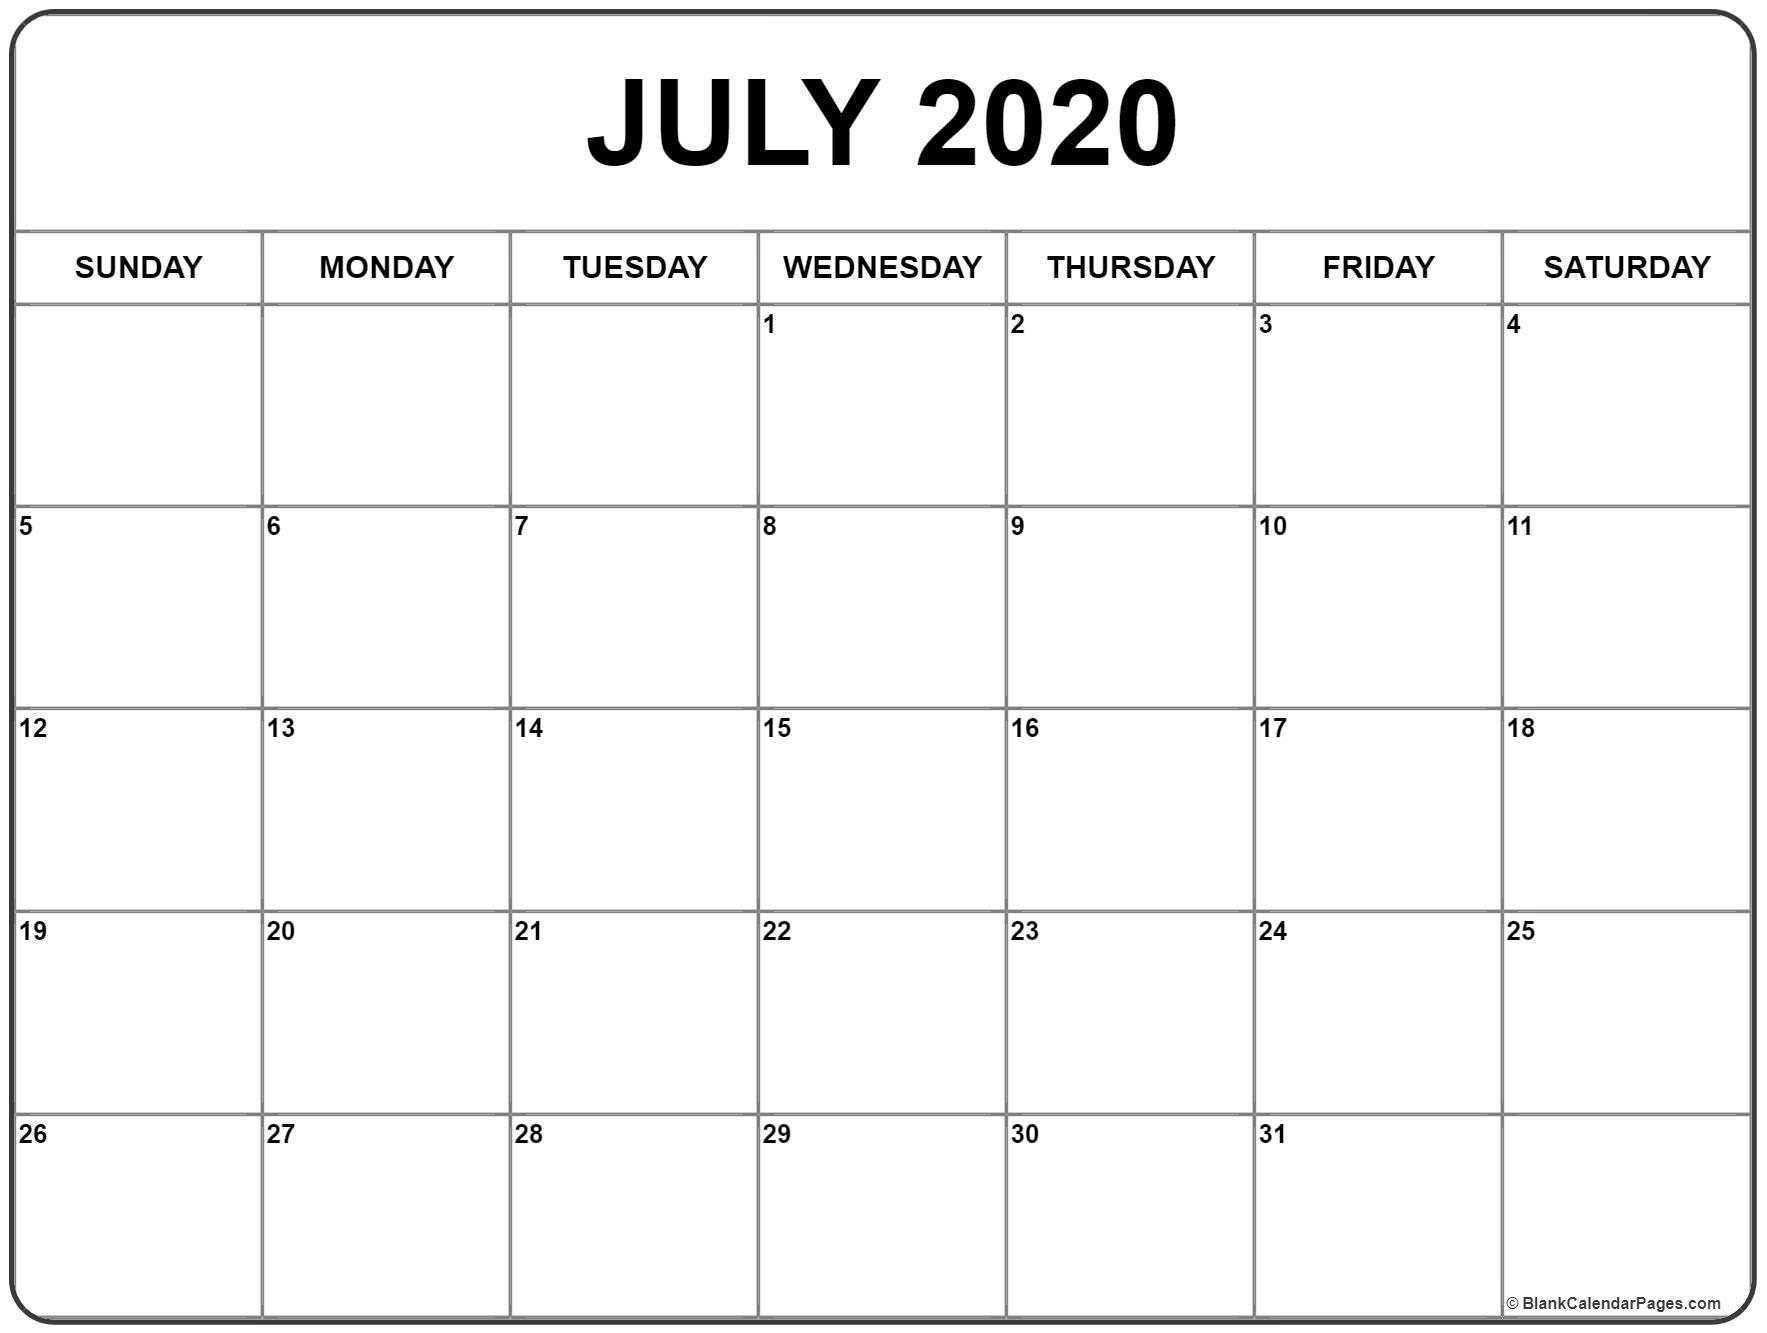 July 2020 calendar January calendar Blank calendar 1767x1333